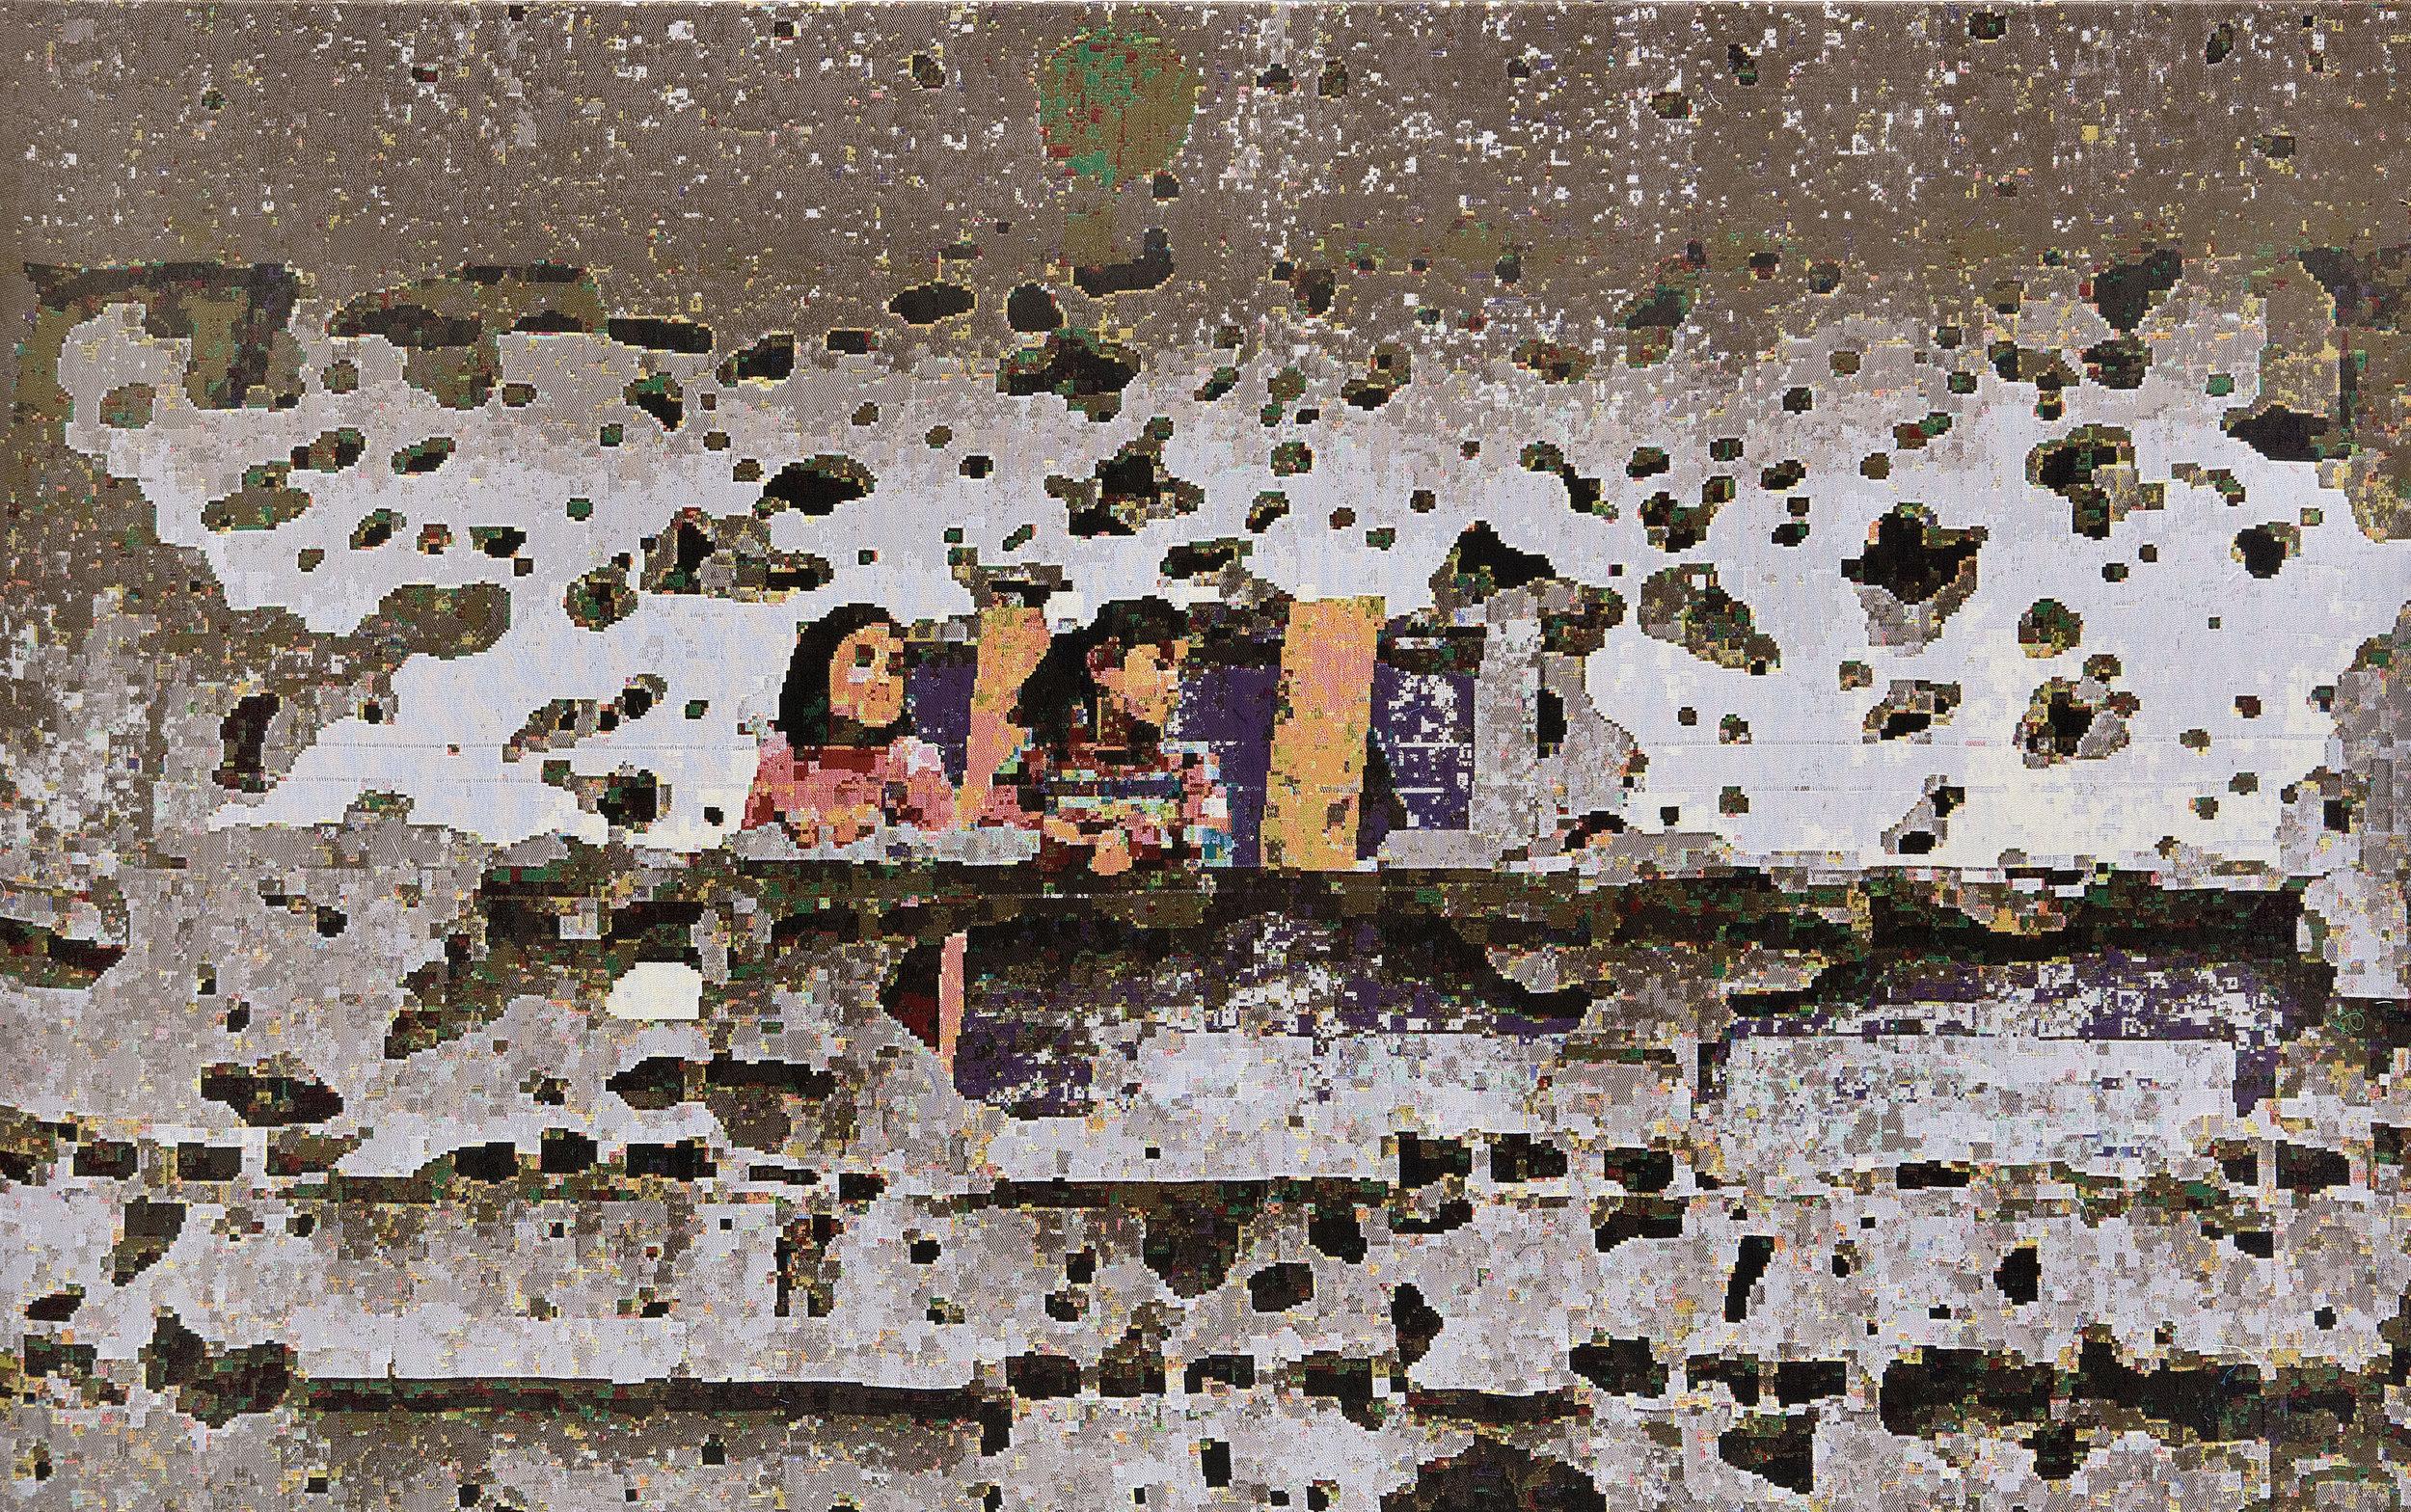 Faith 2009: Gaza II, Jacquard woven, 149 x 230 cm